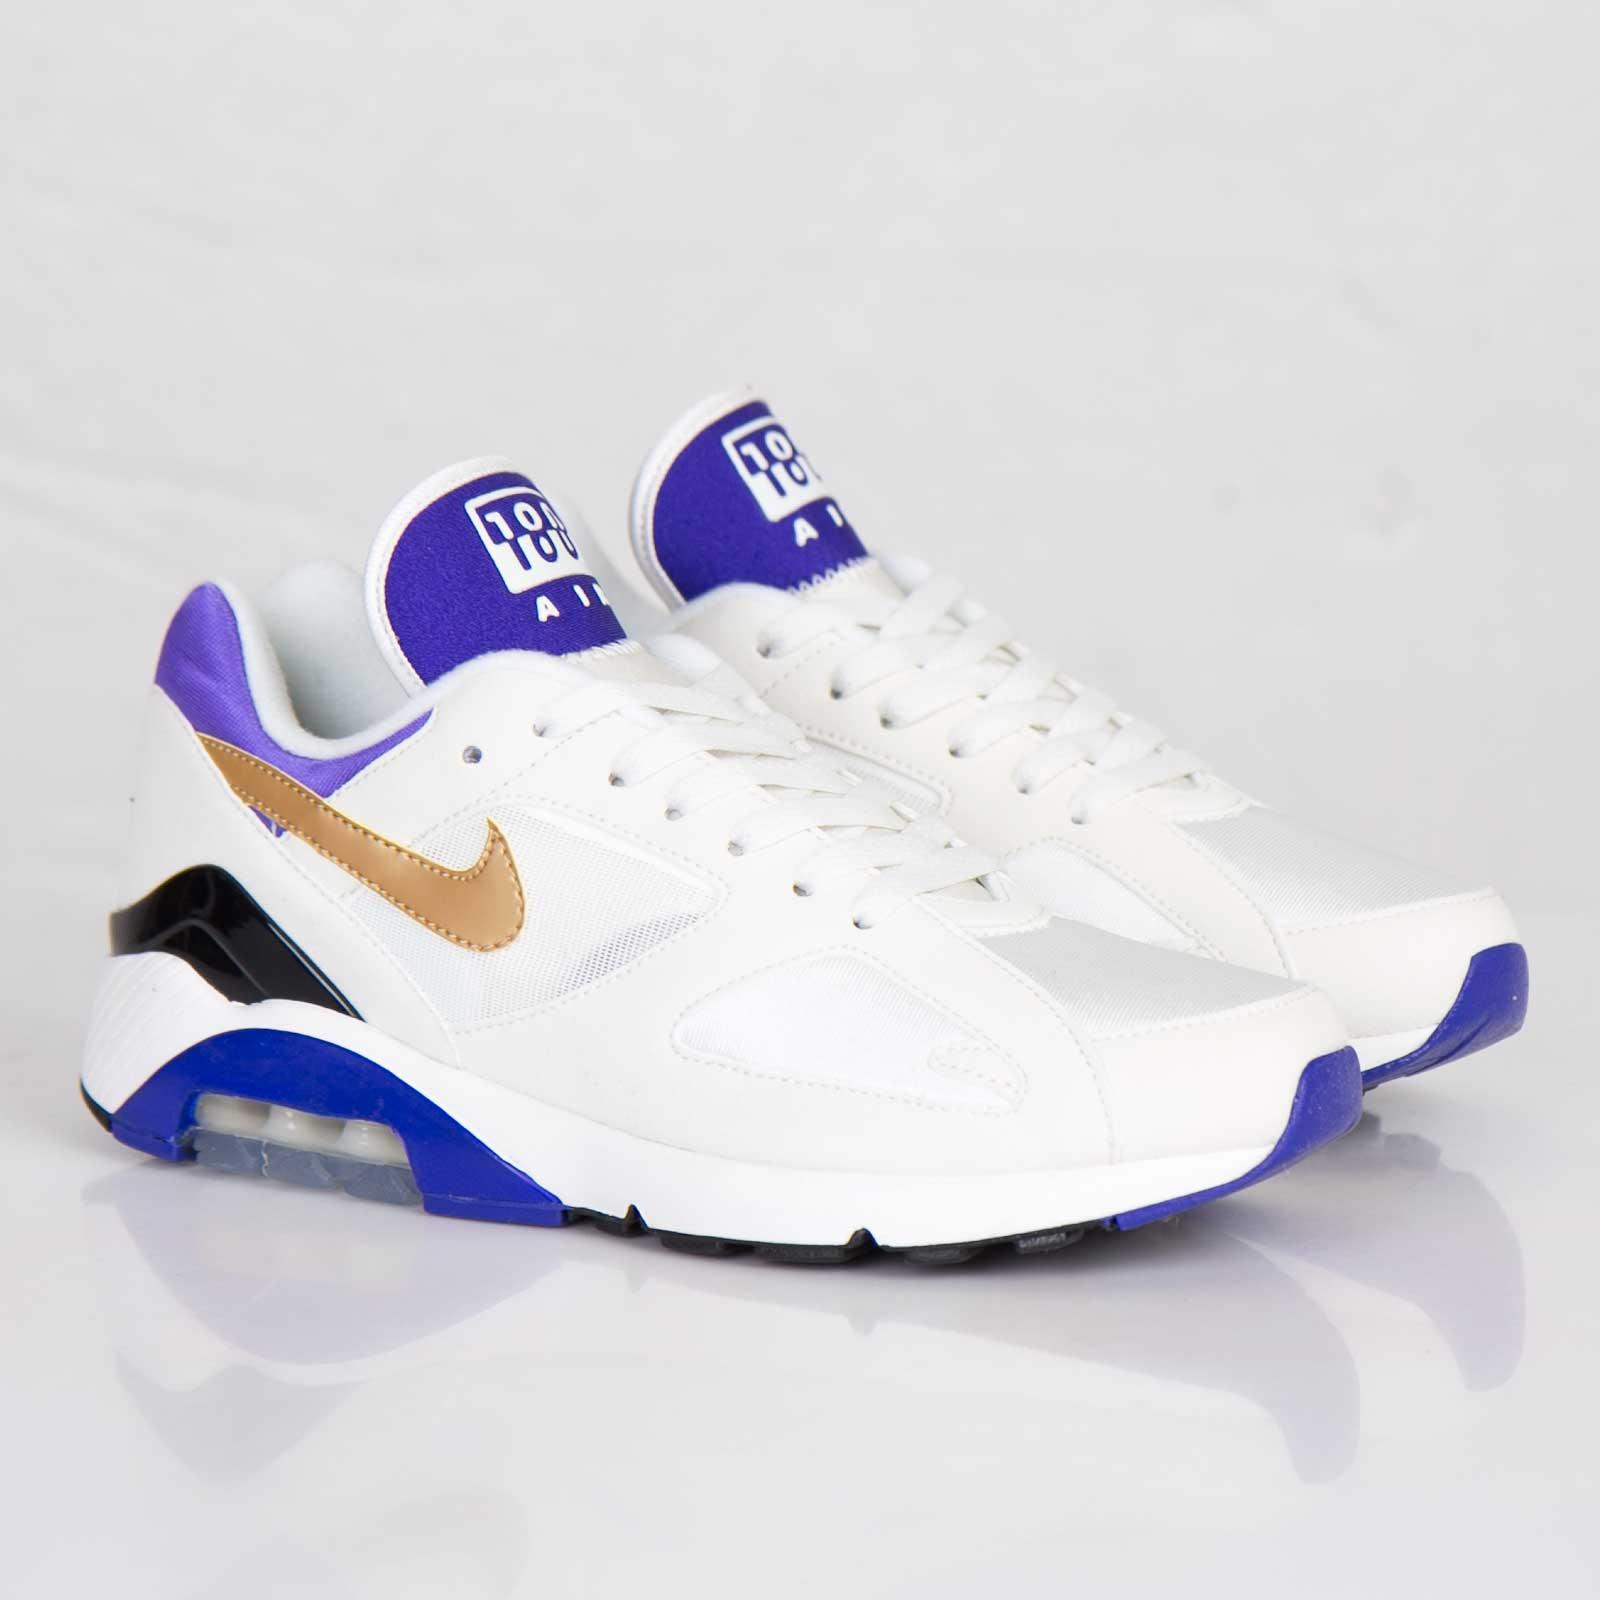 97700534e4 Nike Air 180 QS - 626960-175 - Sneakersnstuff   sneakers ...